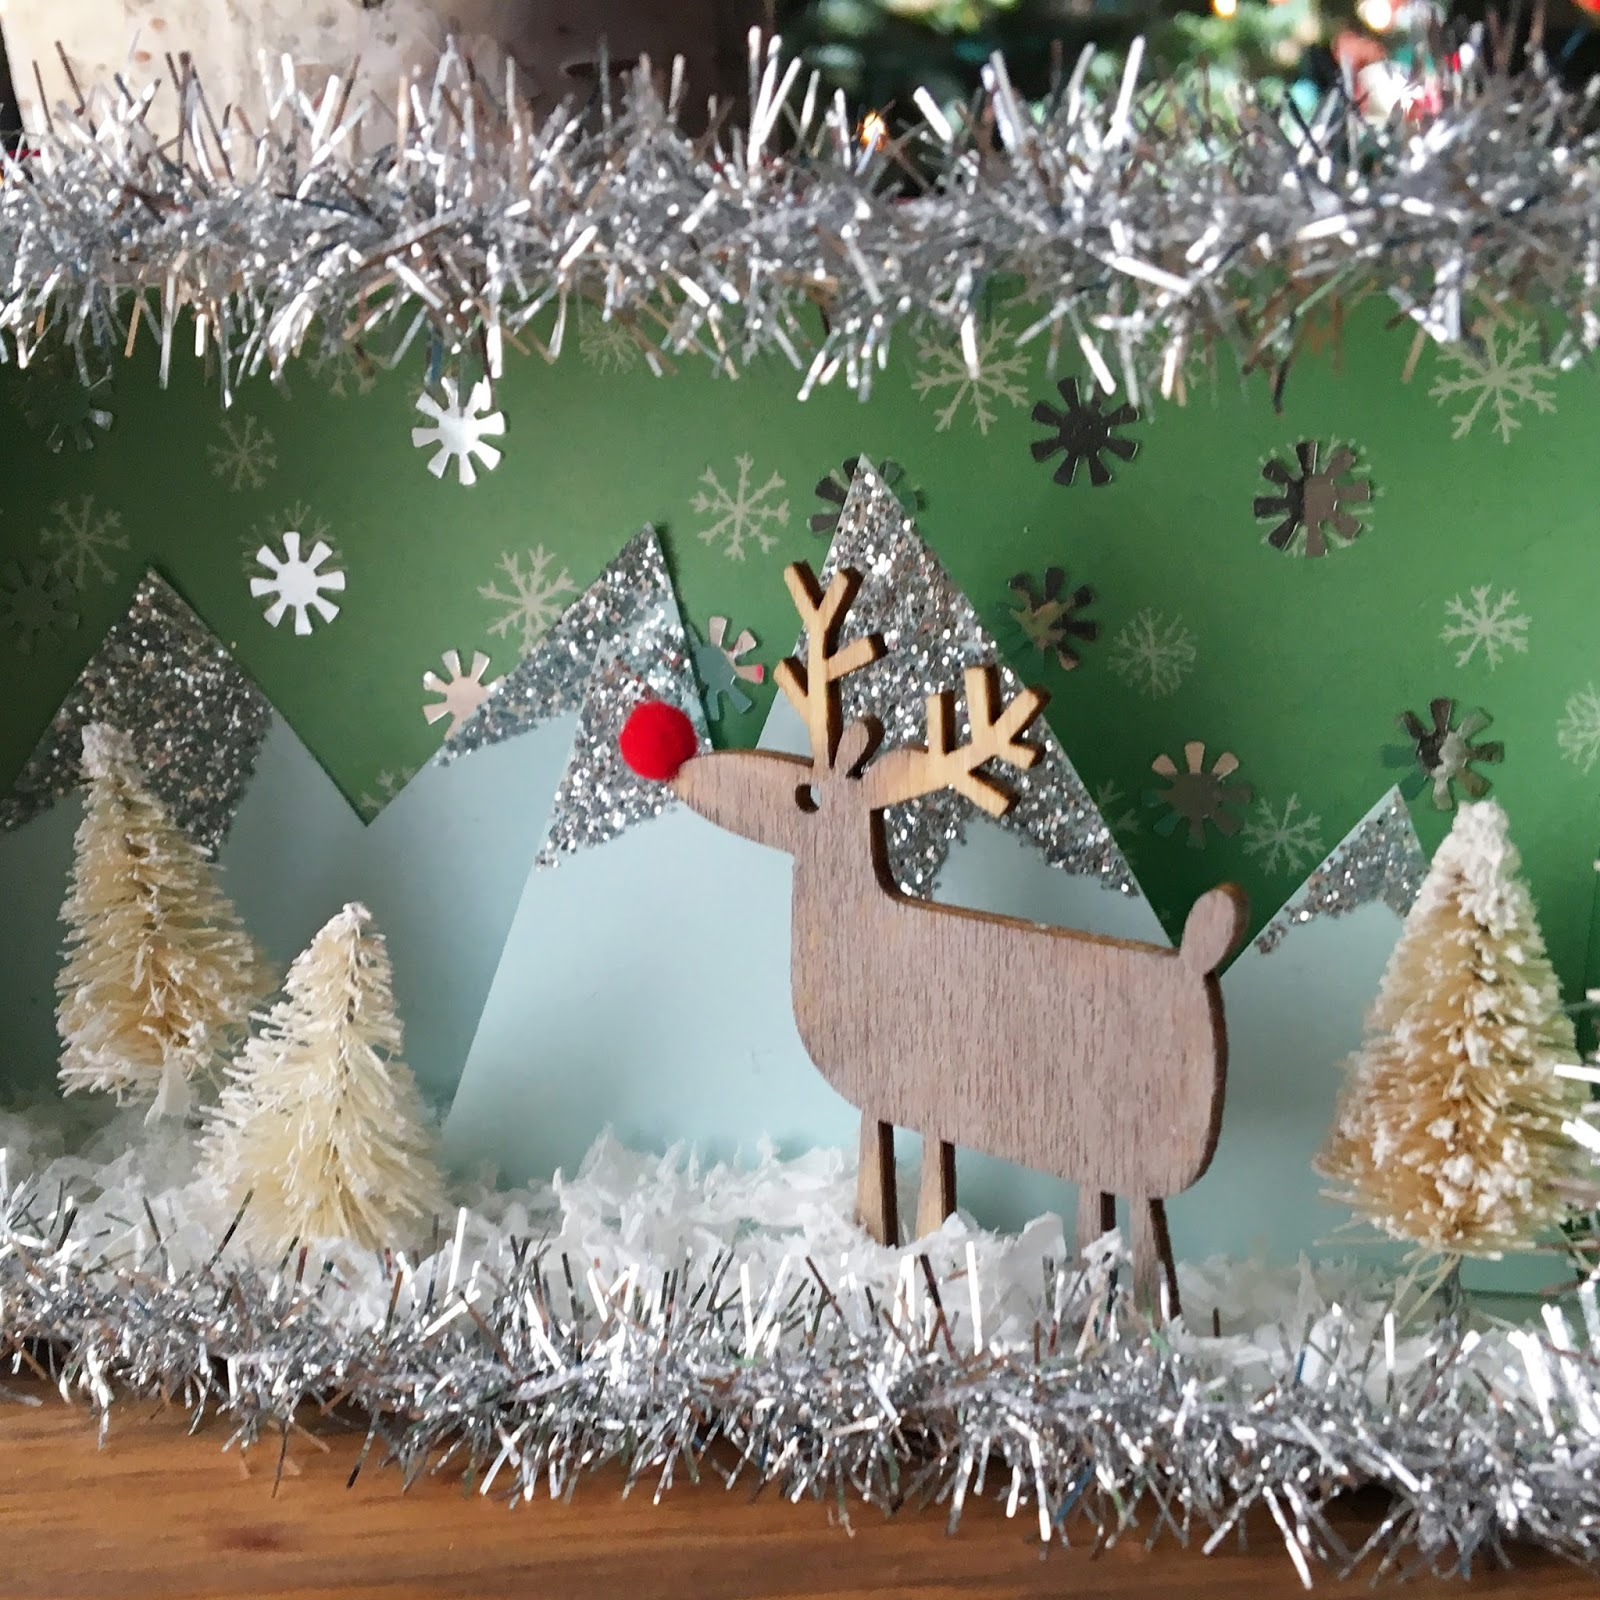 Christmas Shoebox Diorama.Crafty Lumberjacks Boxing In A Winter Wonderland